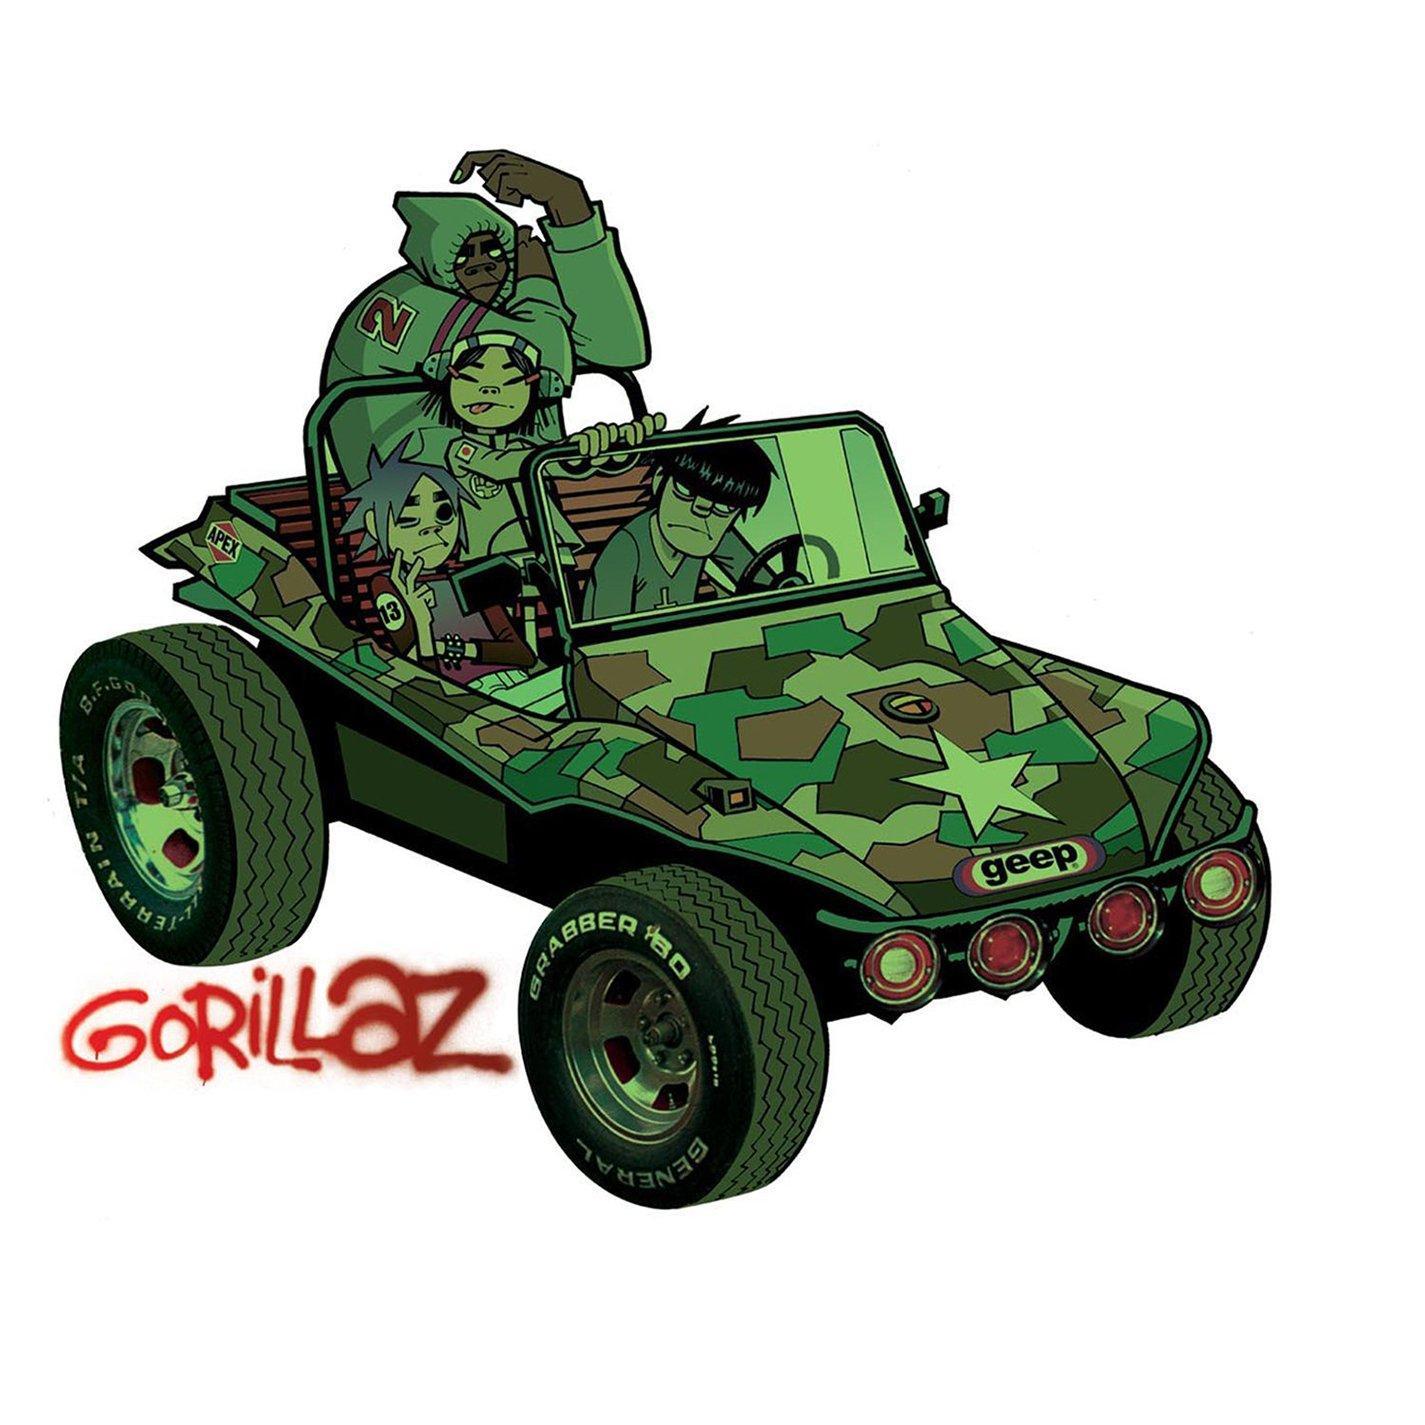 Gorillaz - Gorillaz [Clean Version] - Amazon.com Music